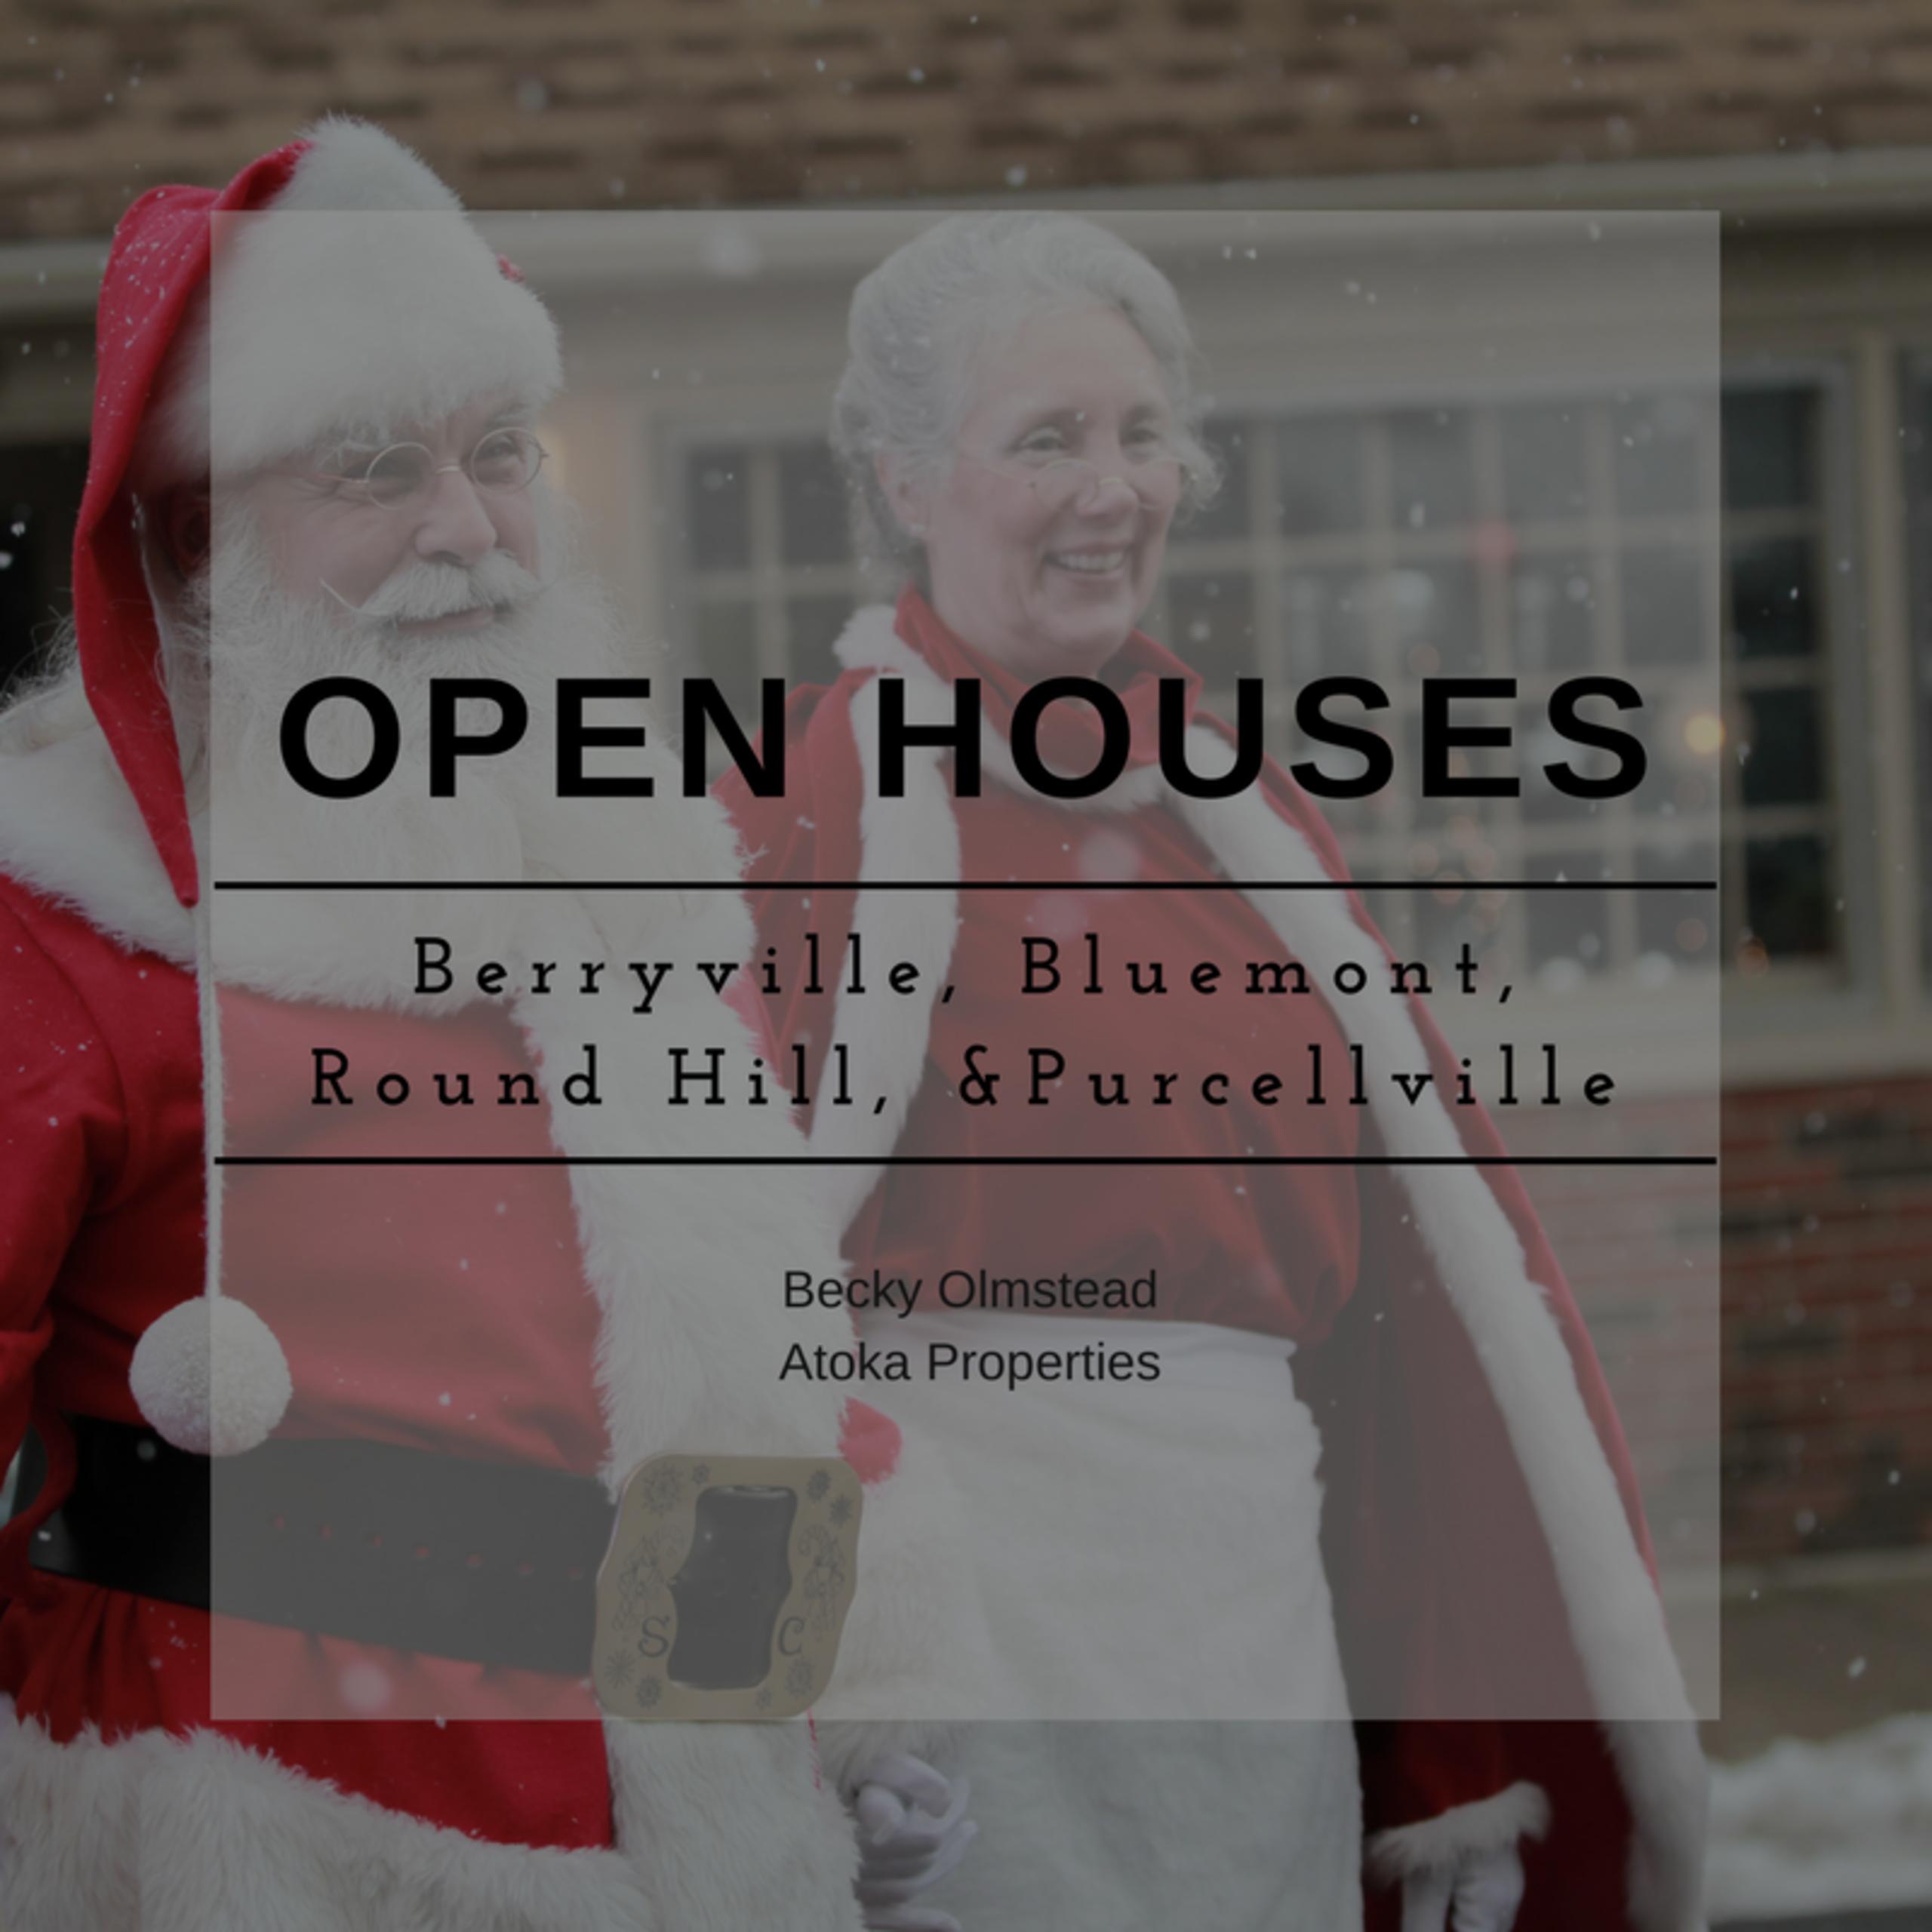 OPEN HOUSE LIST 12/16/17 – 12/17/17